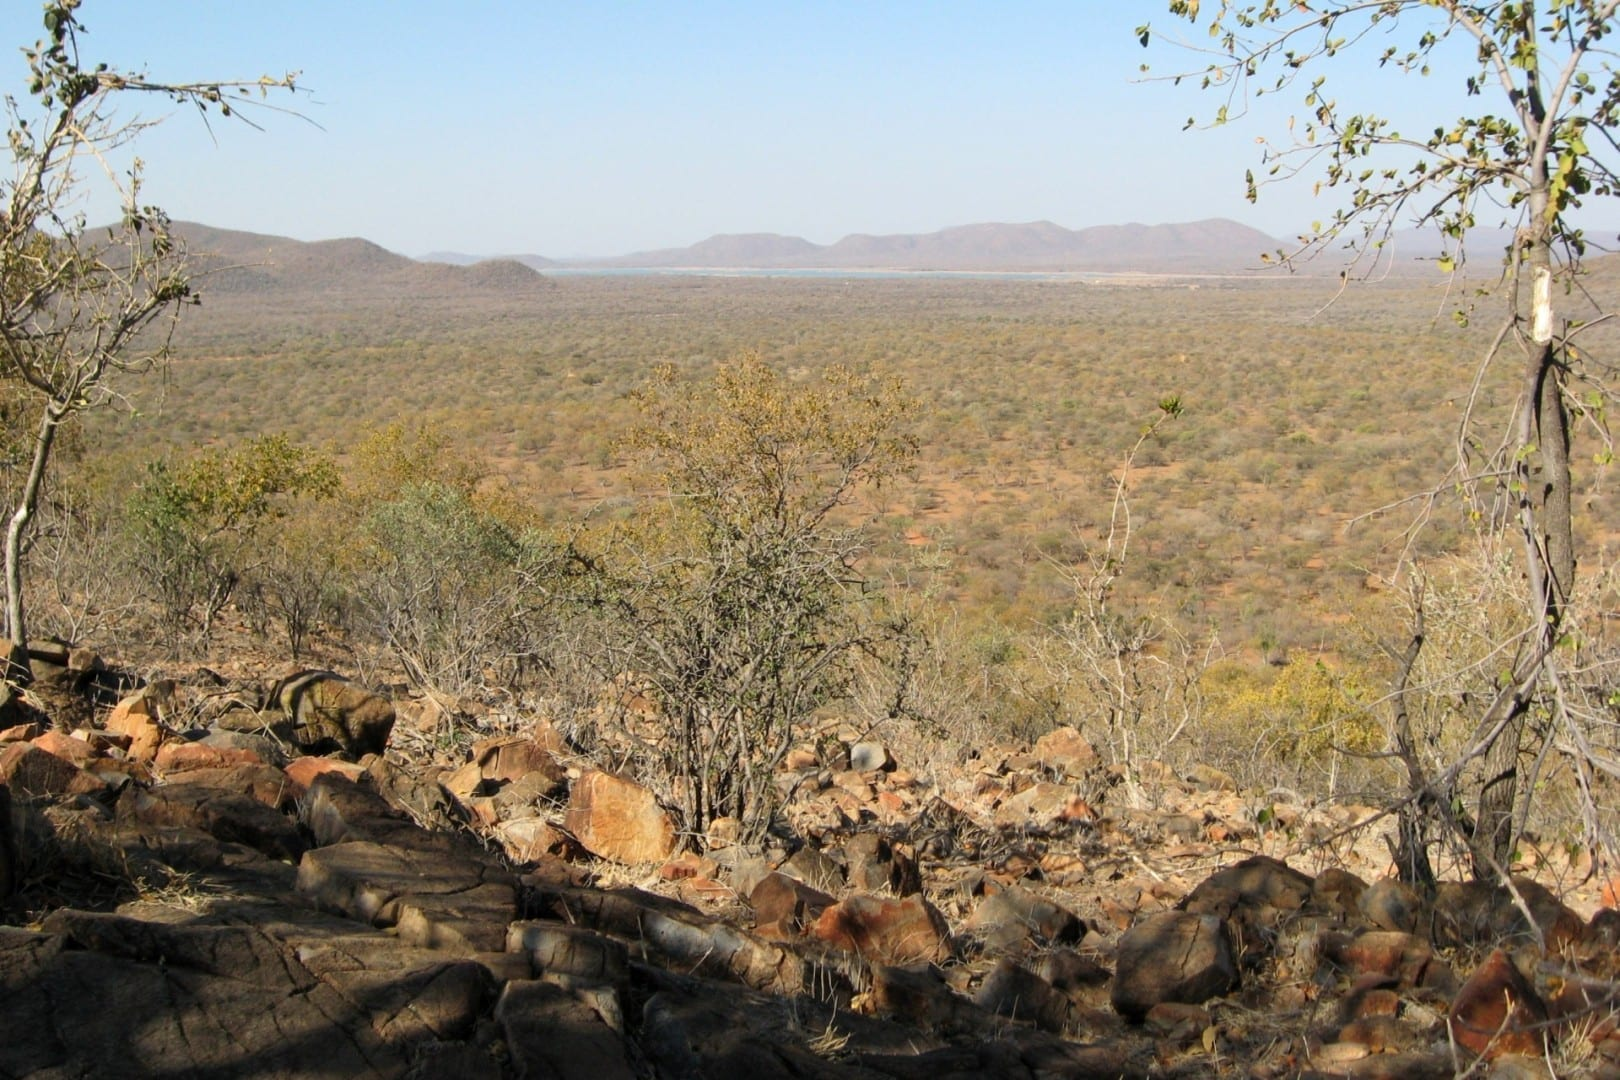 Vista de la Reserva Natural de Mokolodi Gaborone Botswana